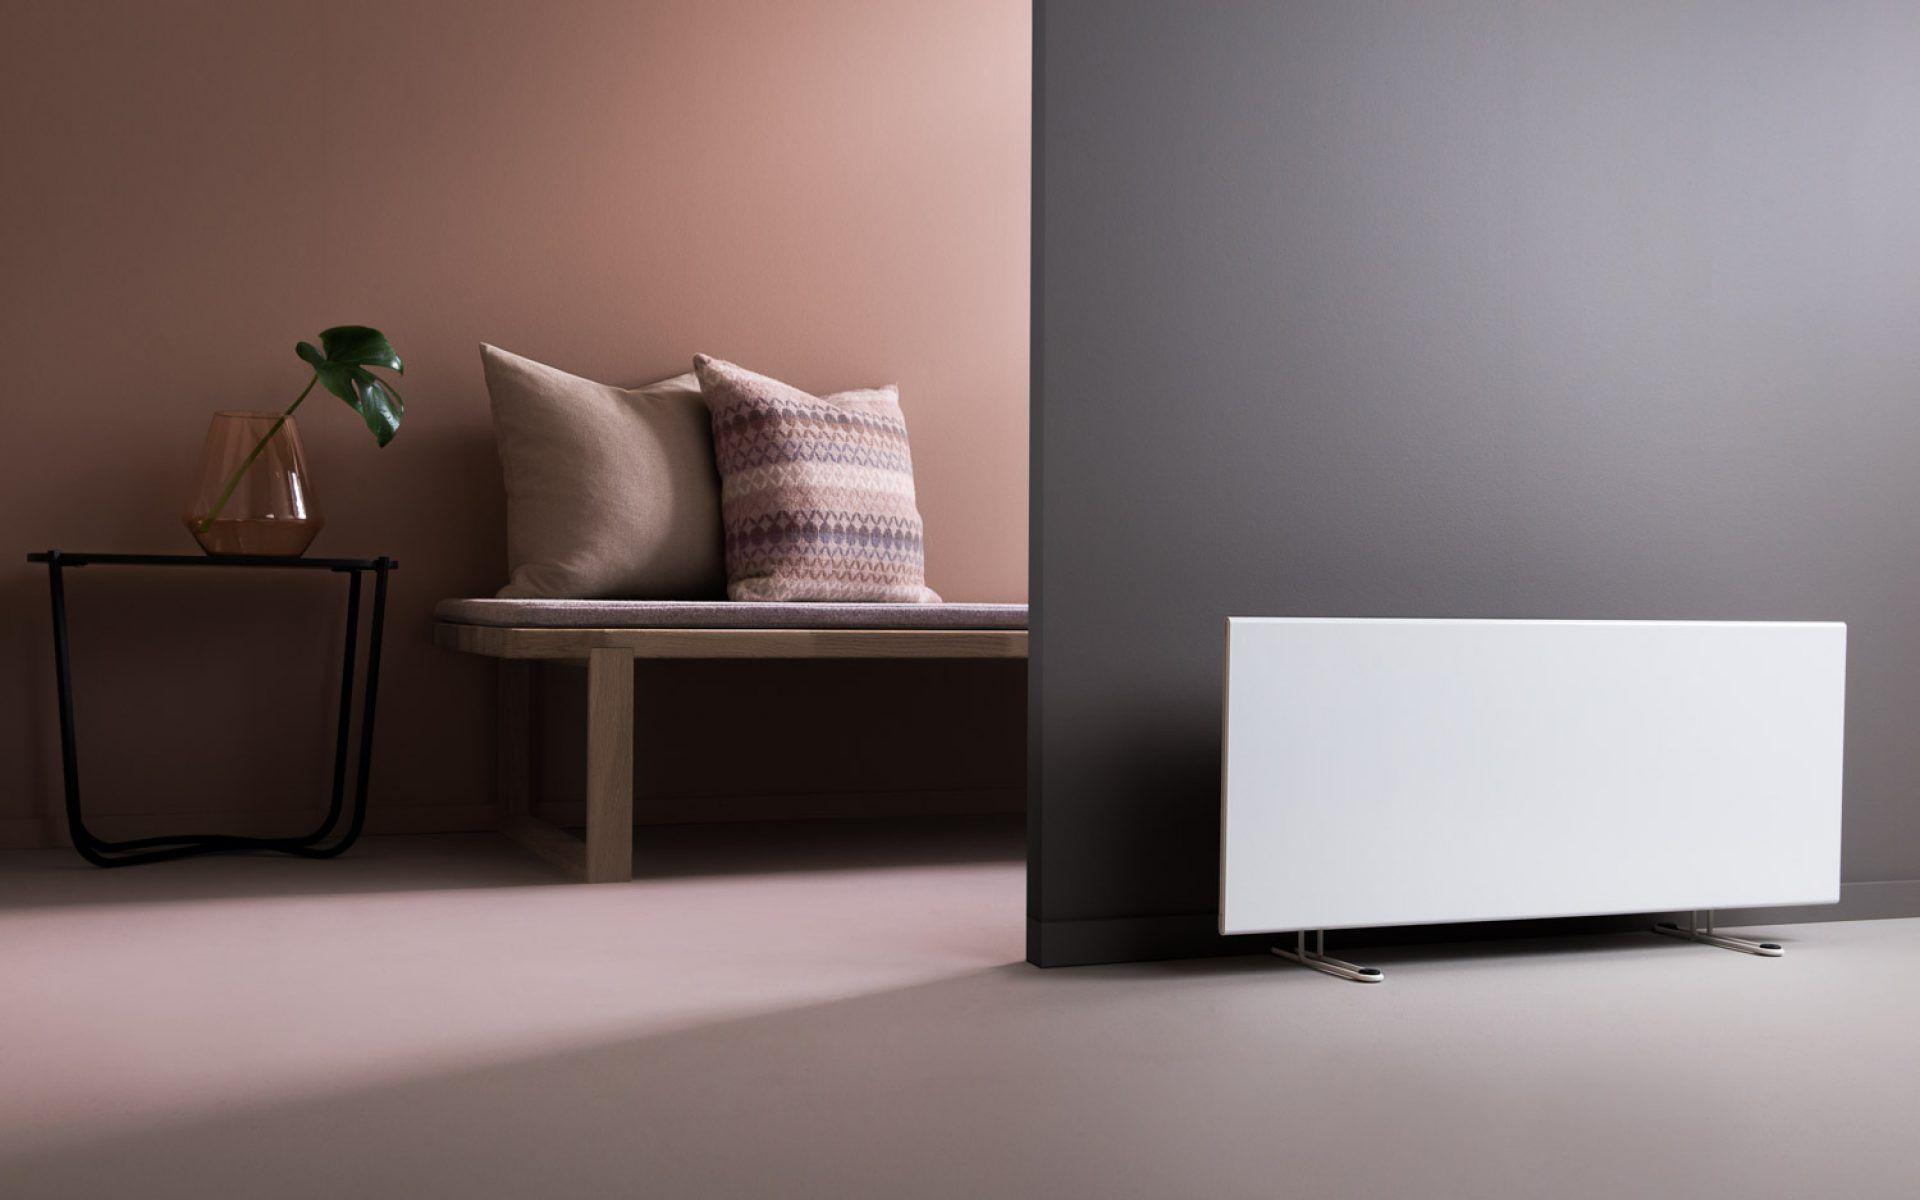 Adax Neo Design.Adax Neo Wifi Modern Electric Wall Heater Home Automation